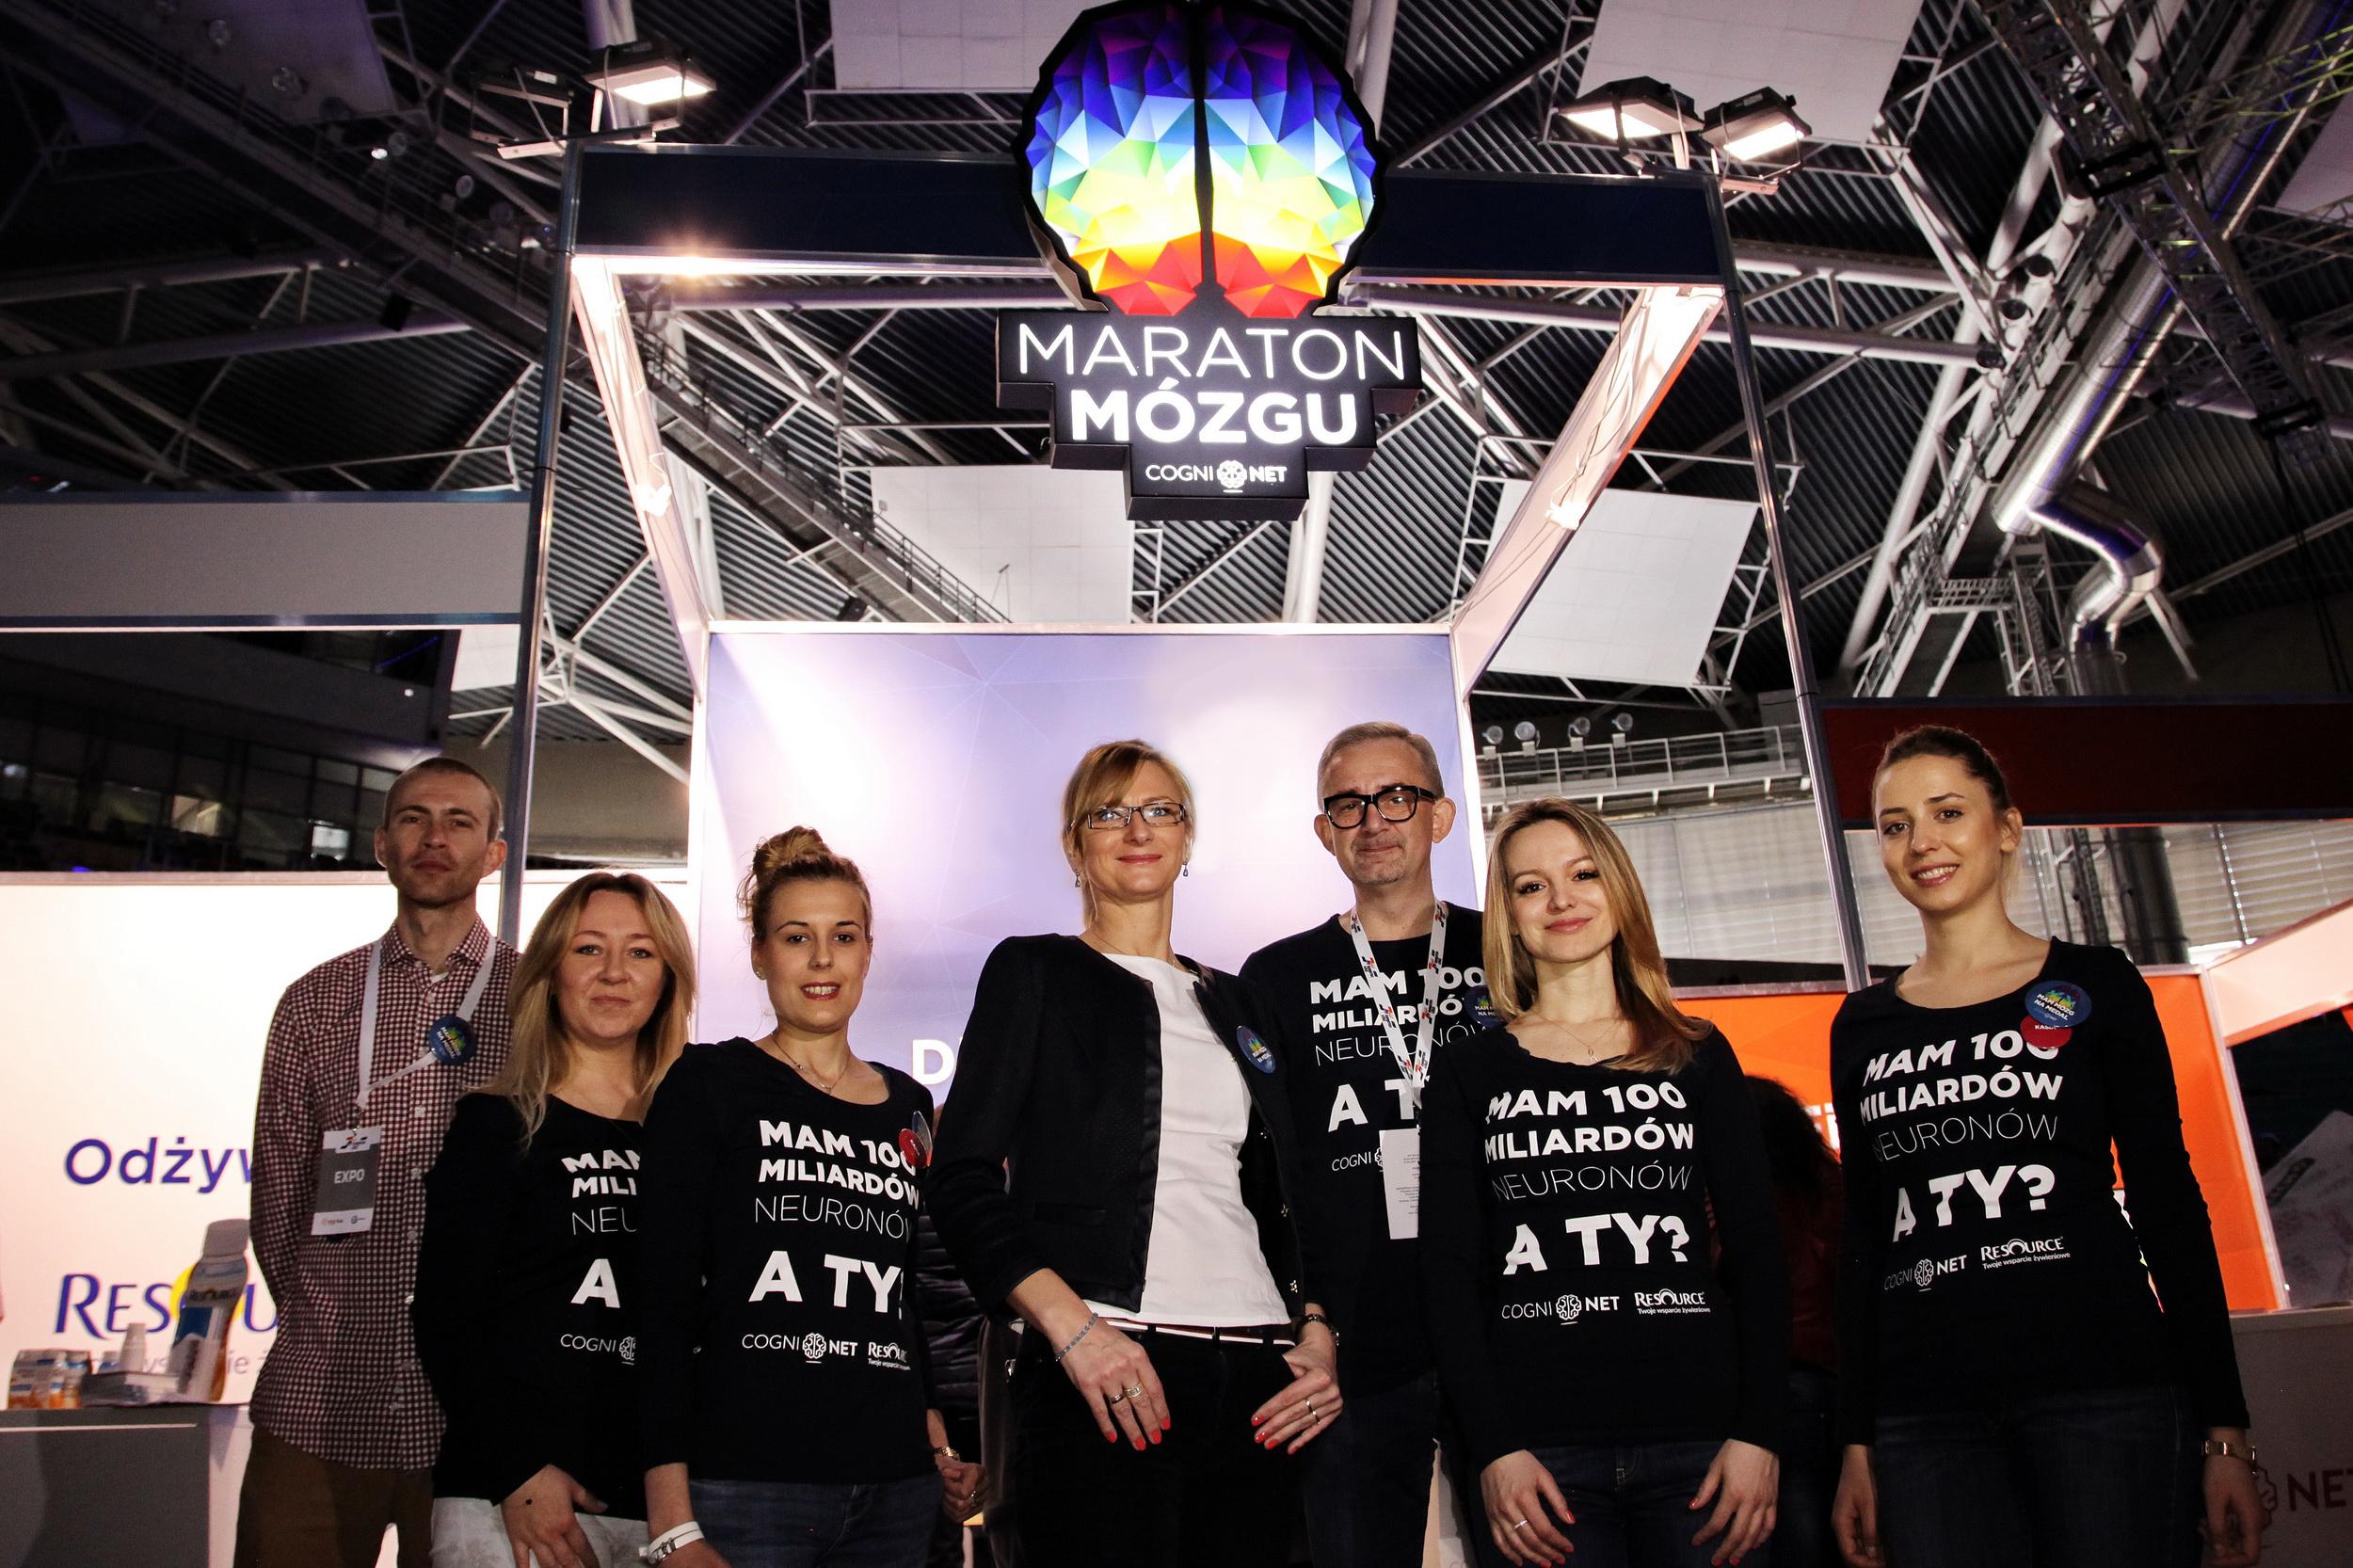 Maraton Mózgu